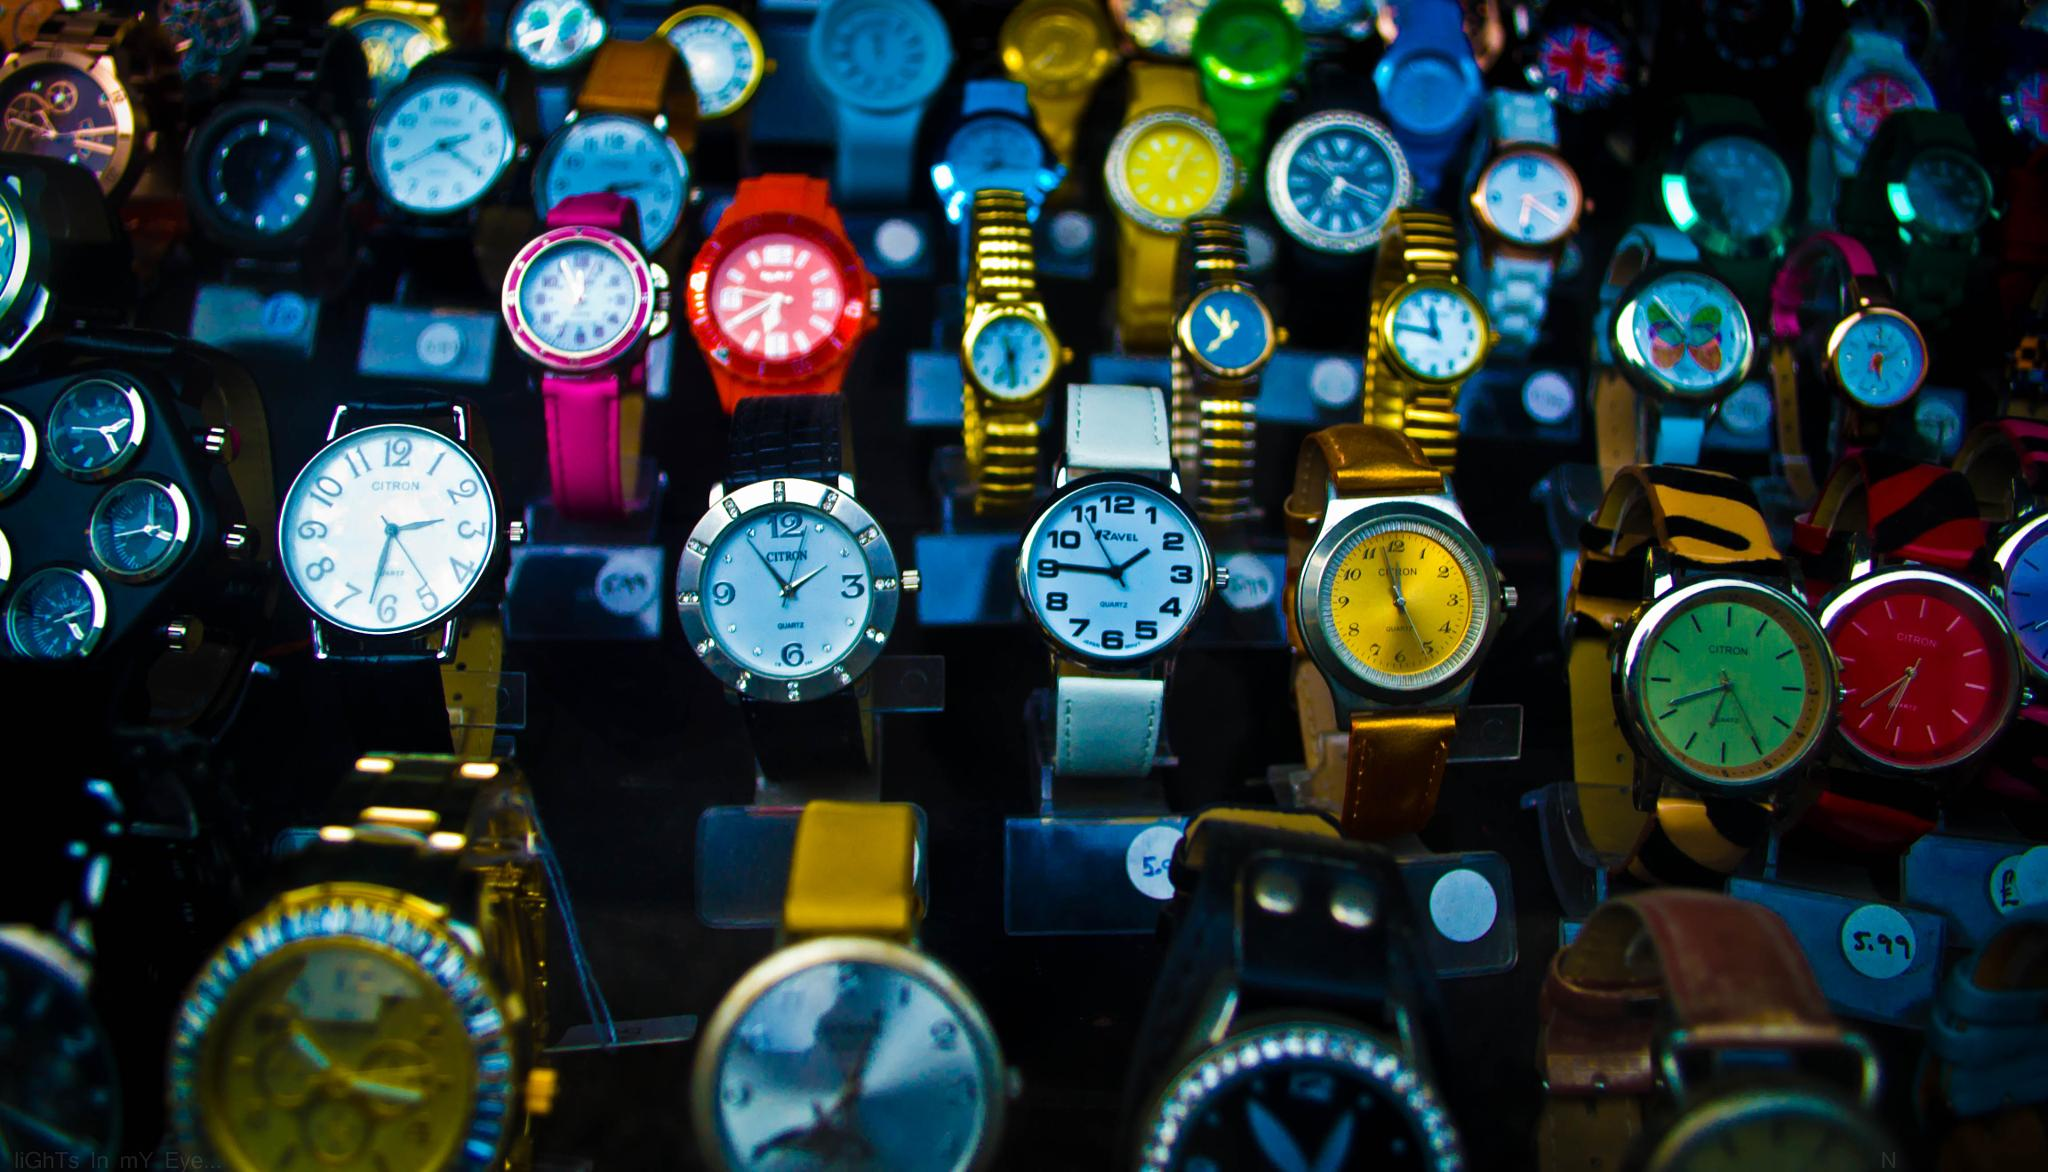 got the time plz... by neil.hickman1